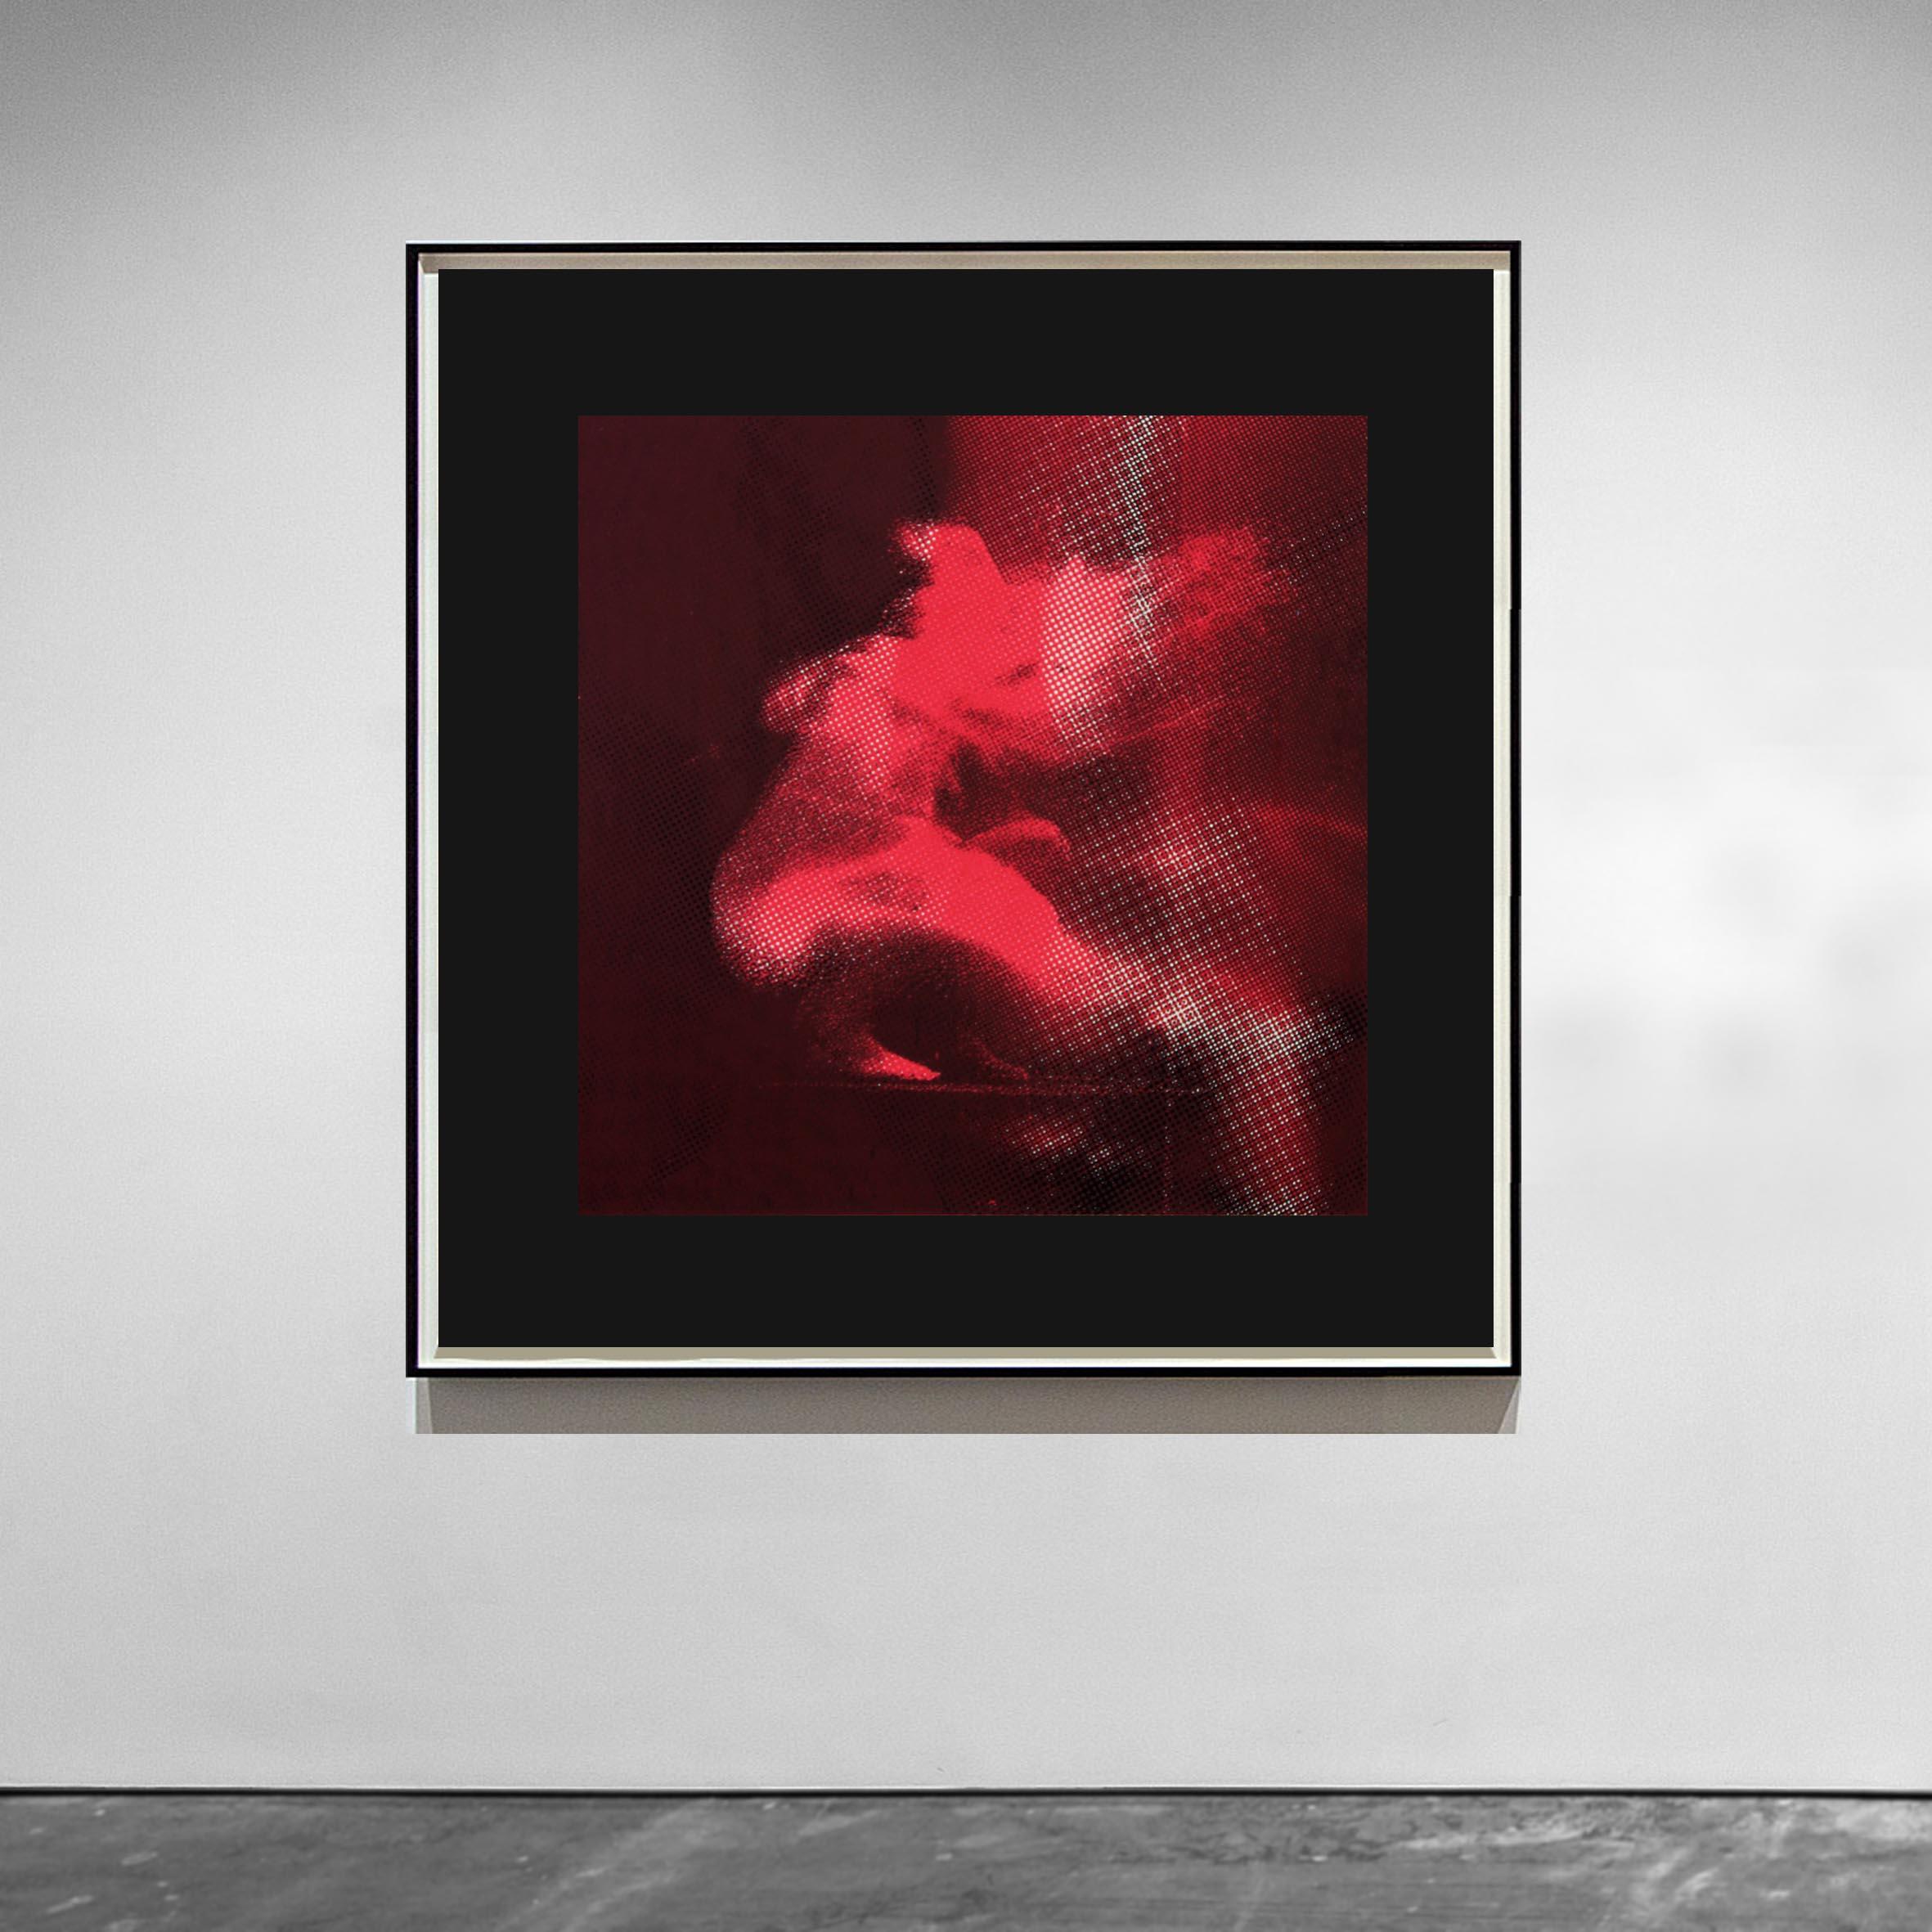 Aura  I - 2014 - Screen print on paper - 30 x 30 cm  - Edition of 01